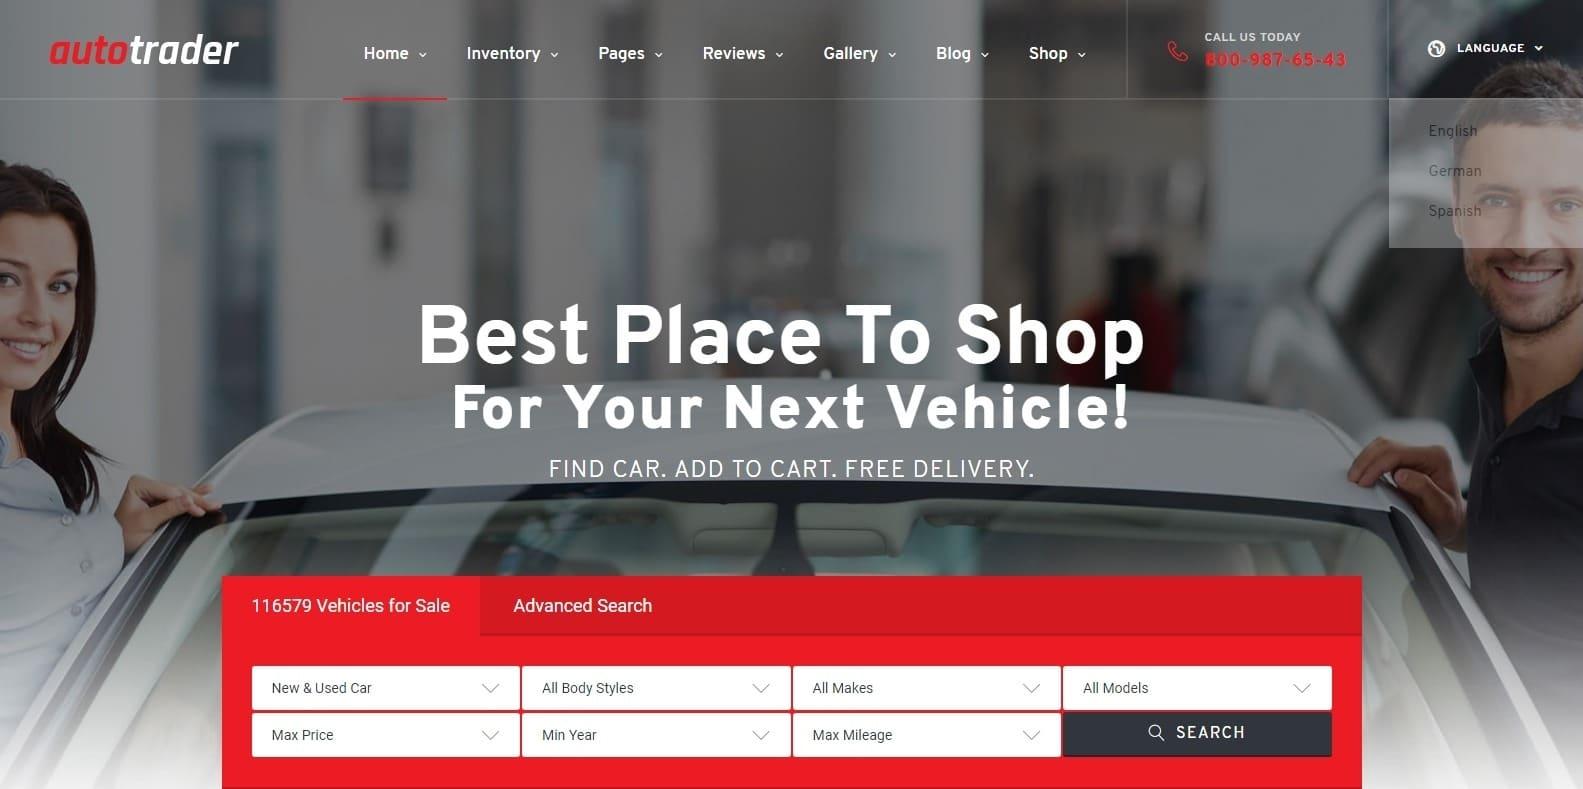 autotrader-automotive-website-template